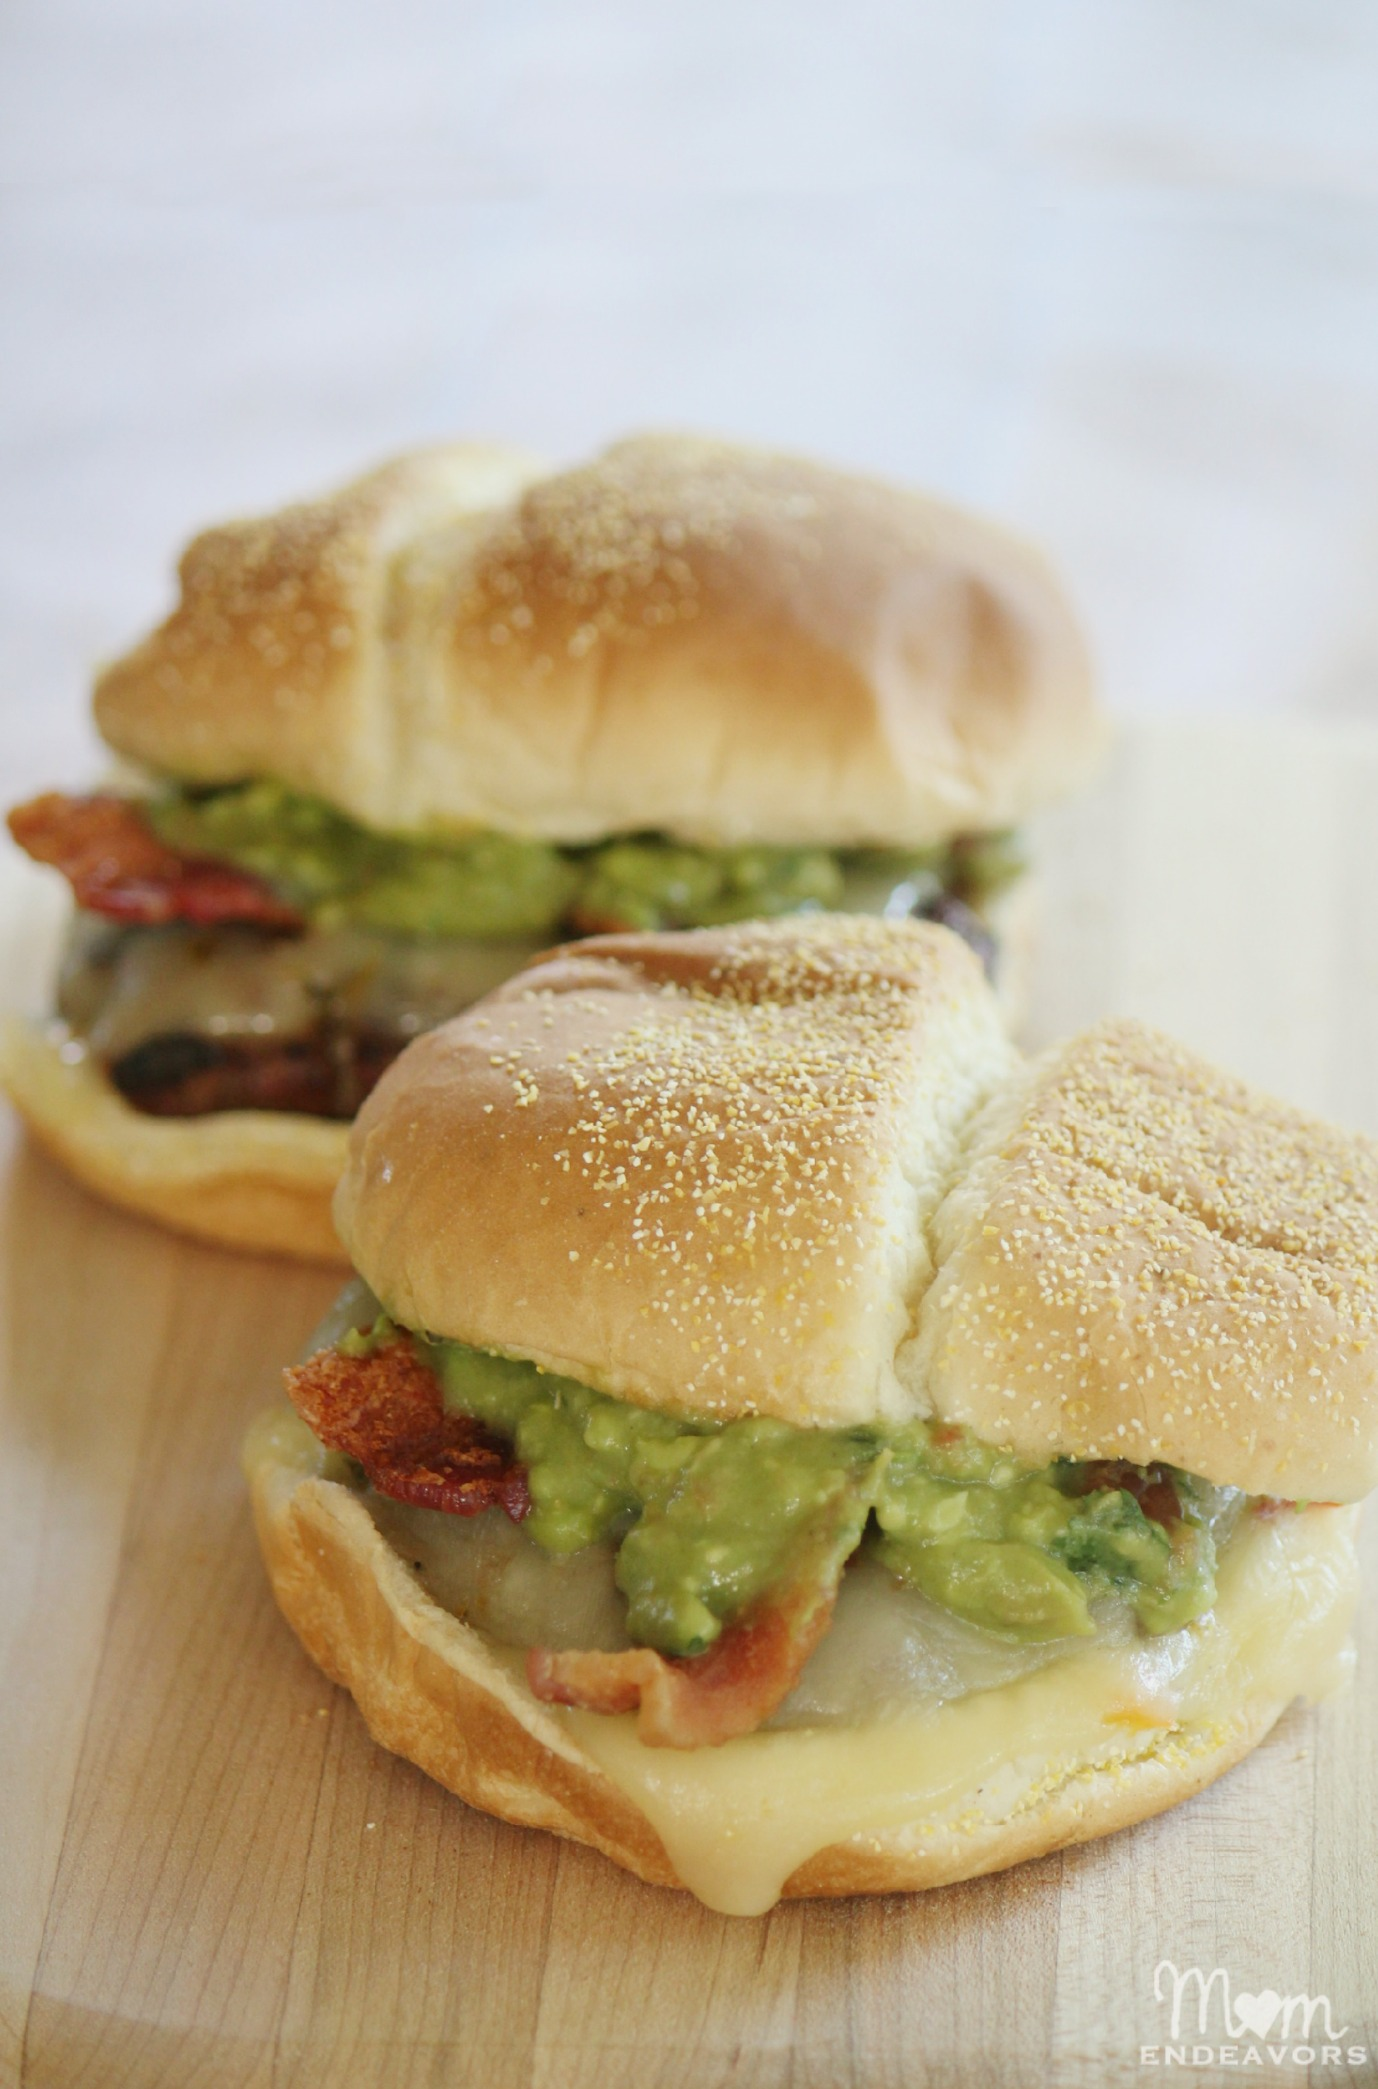 Southwestern Bacon Cheeseburgers with Guacamole